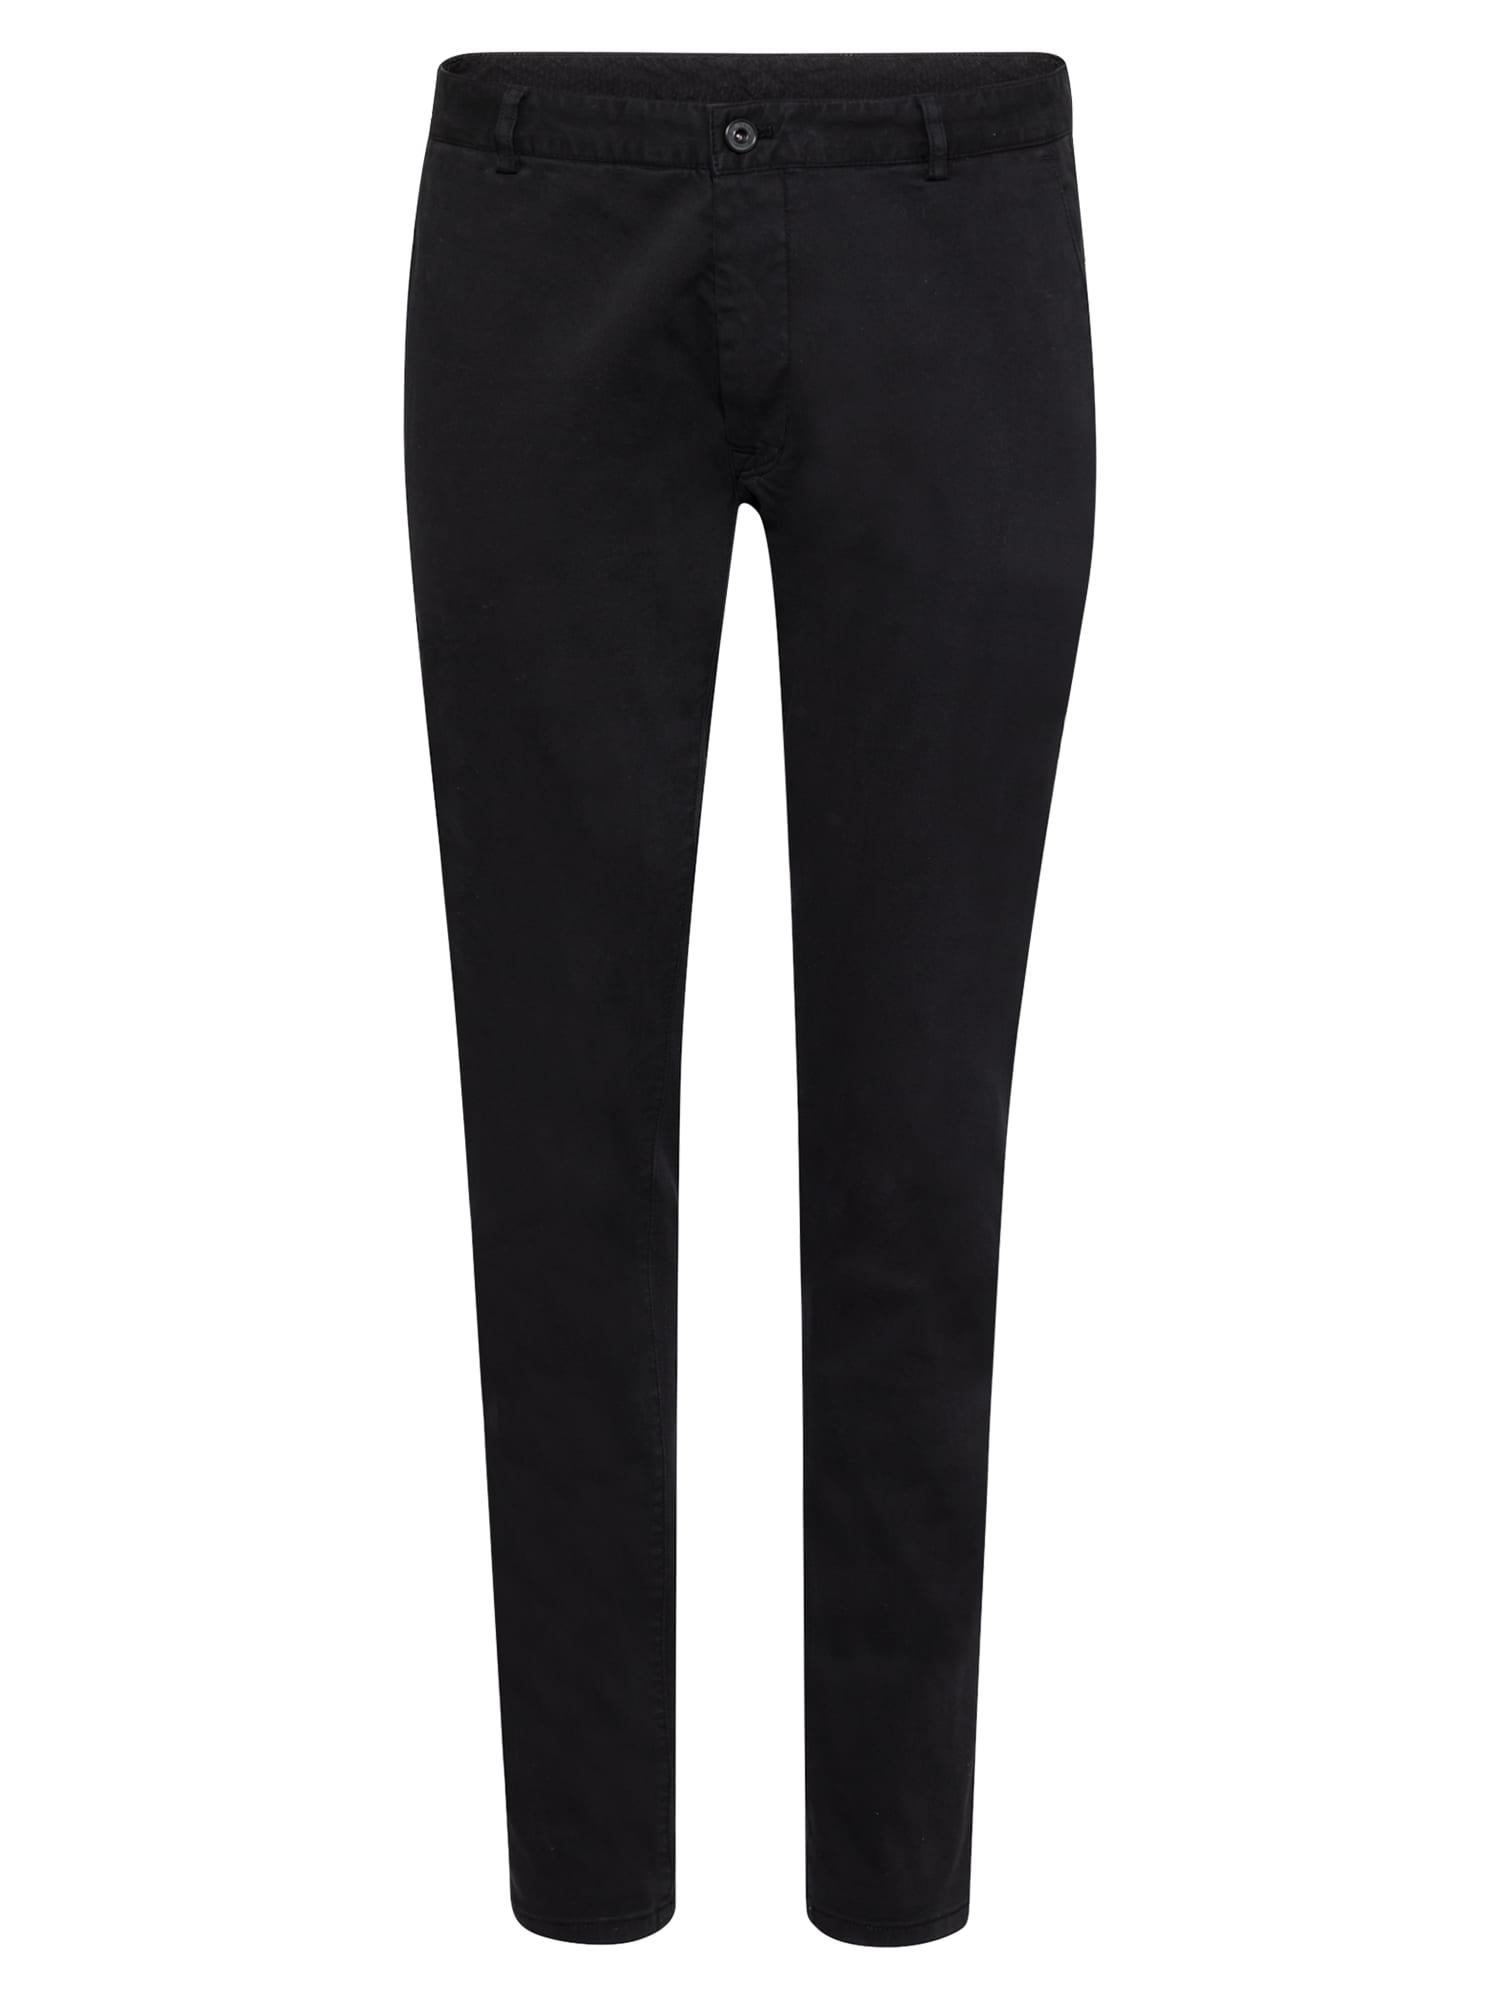 Tiger of Sweden Pantalon 'TRANSIT 4.'  - Noir - Taille: 52 - male